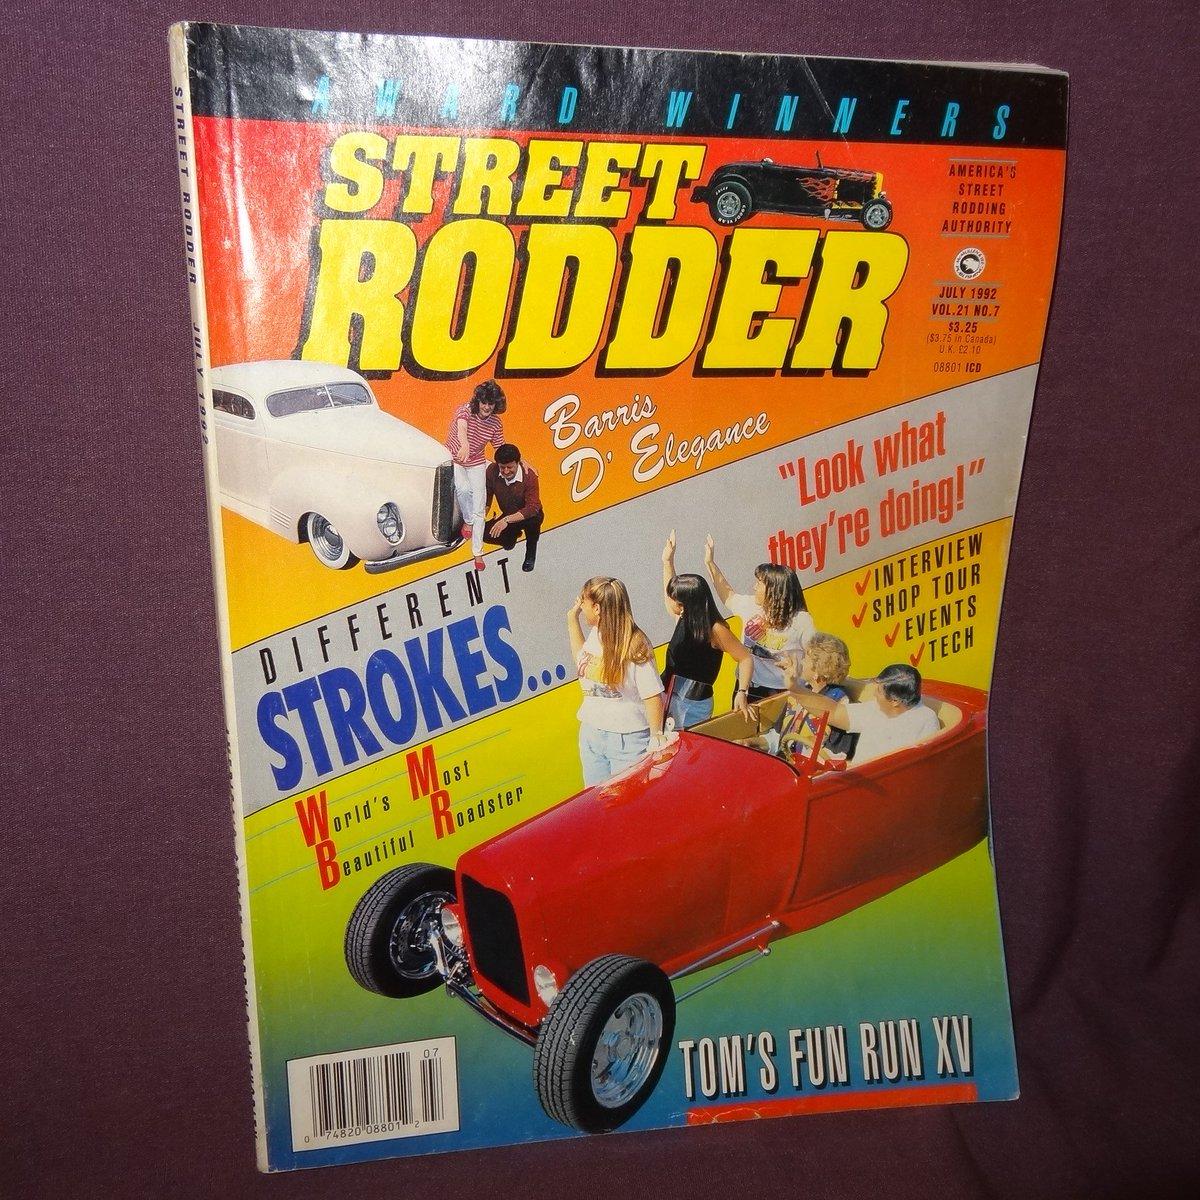 https://www. ebay.com/itm/1427699069 91 &nbsp; …  #StreetRodder #Magazine July 1992 Different Strokes Fun Run #Cars  http:// stores.ebay.com/ktefashionandc ollectibles &nbsp; … <br>http://pic.twitter.com/fb8U2Zos3C